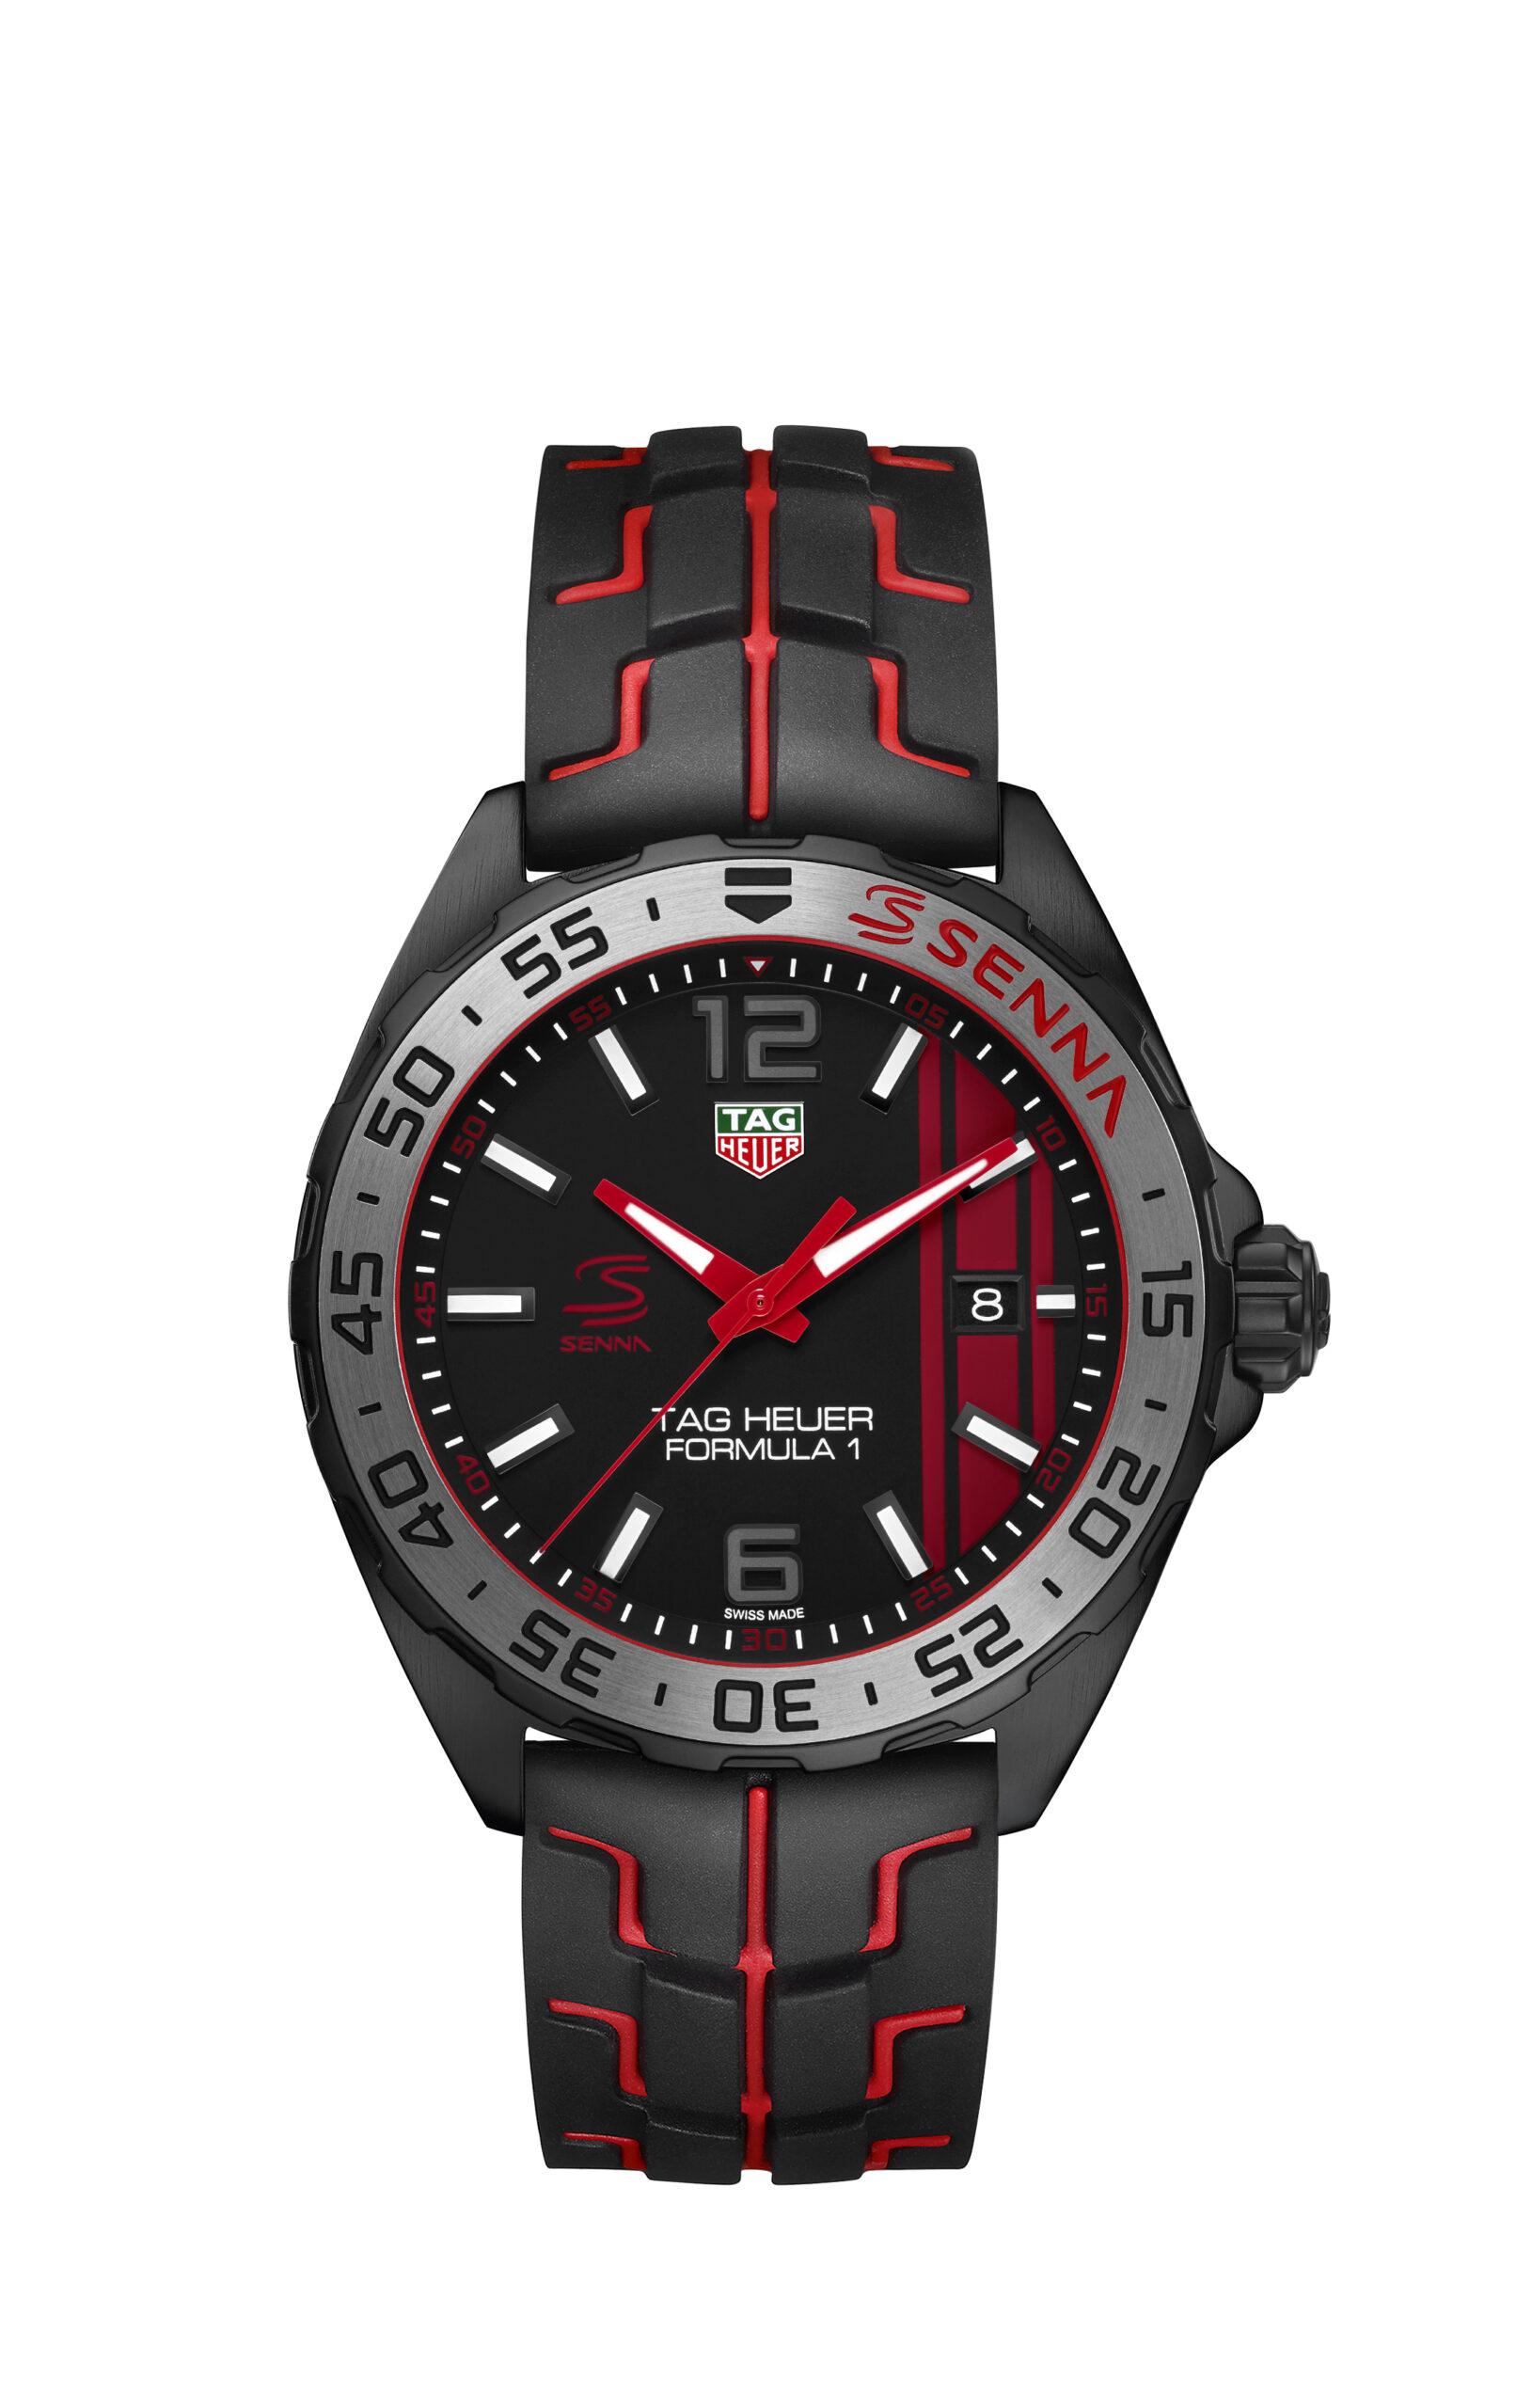 TAG HeuerFormula 1 watch